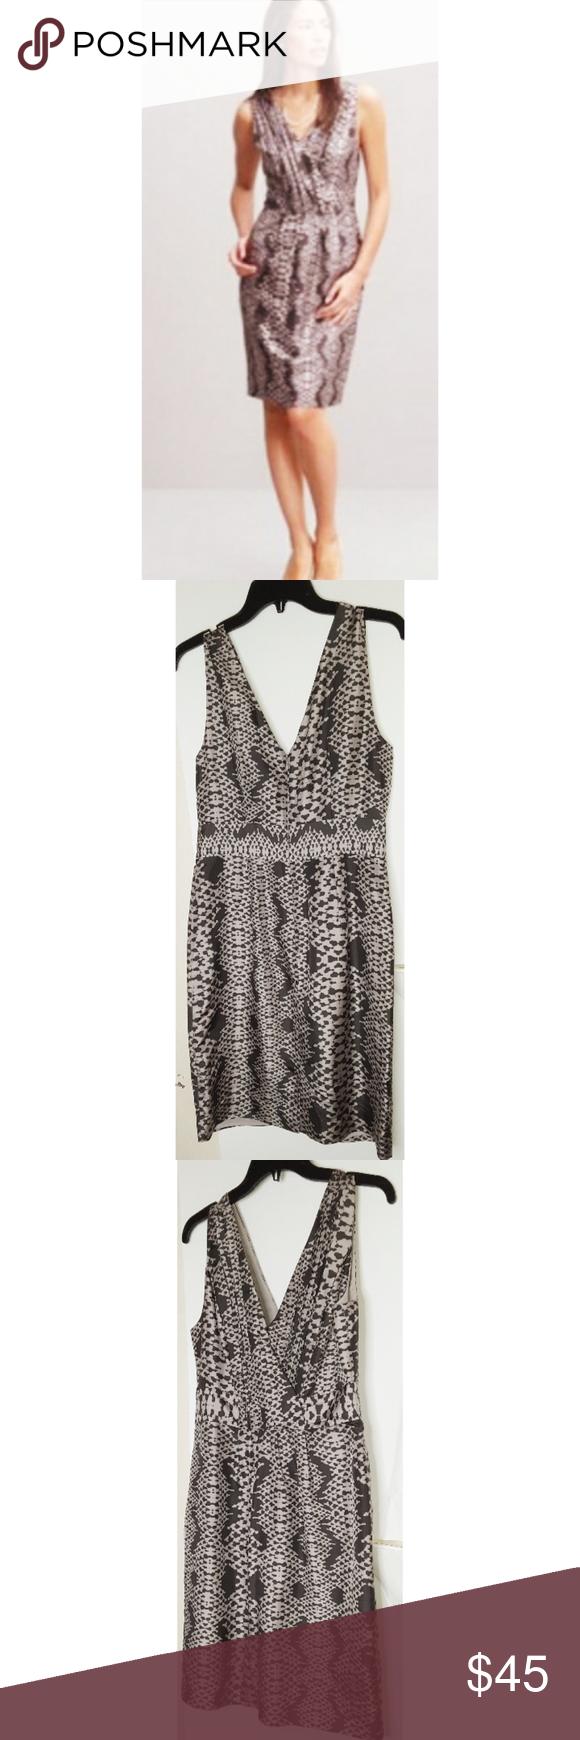 50+ Black and white snake print dress ideas